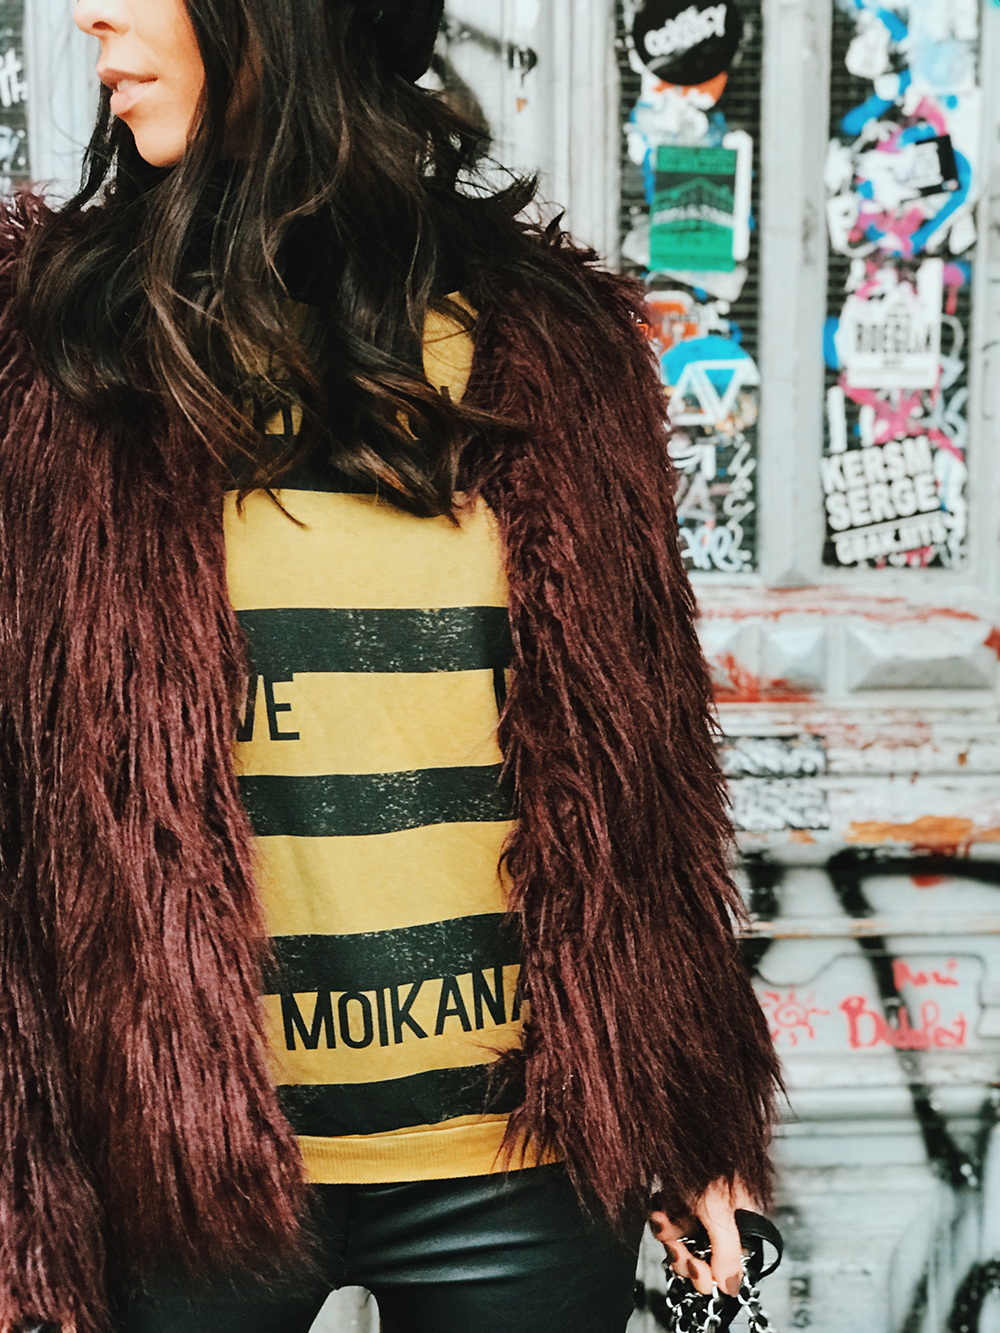 Levando a Moikana pra passear em Berlim